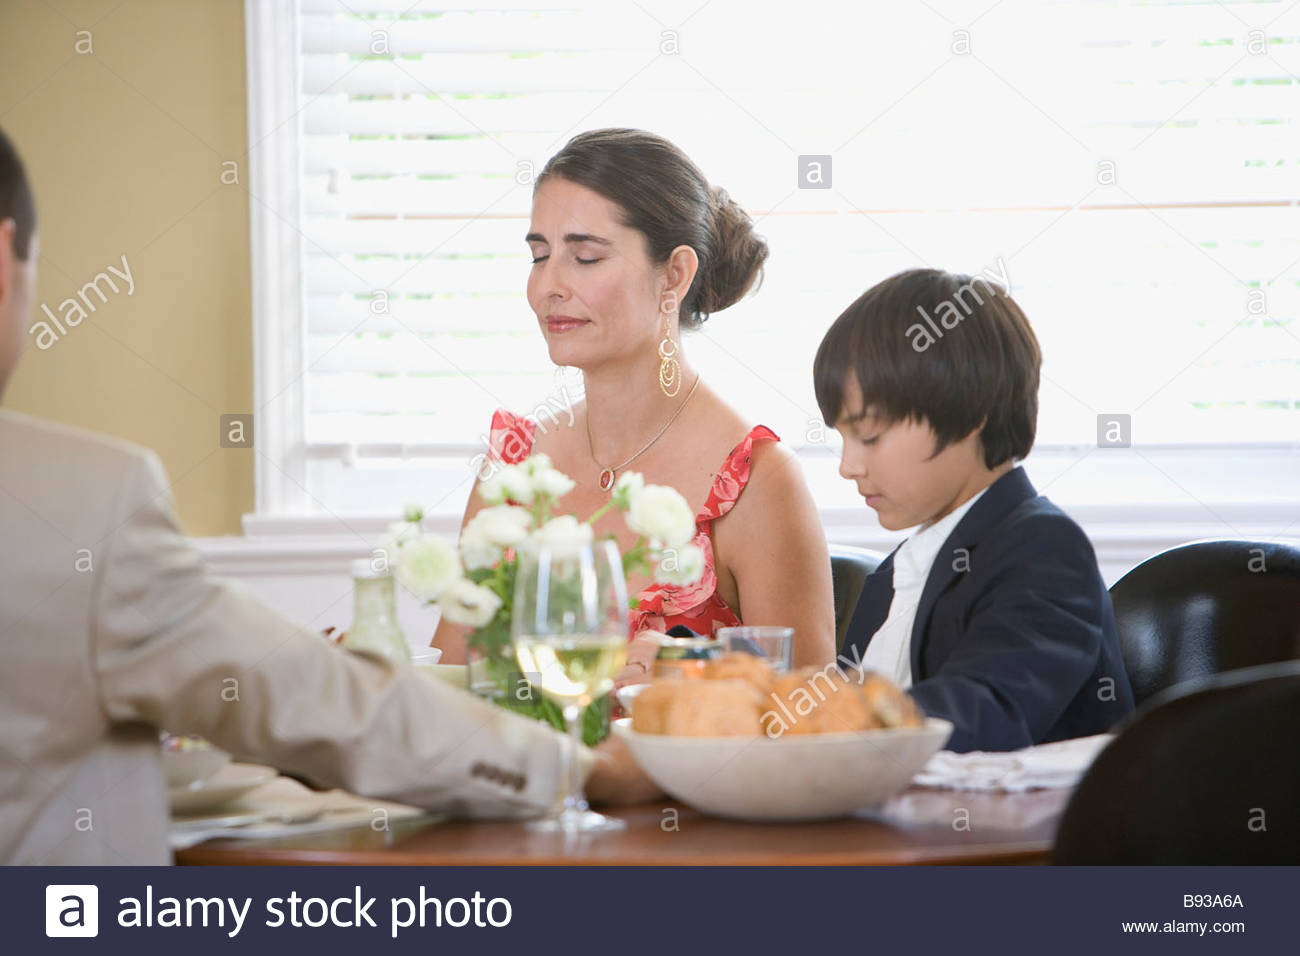 Family saying grace before dinner - Stock Image